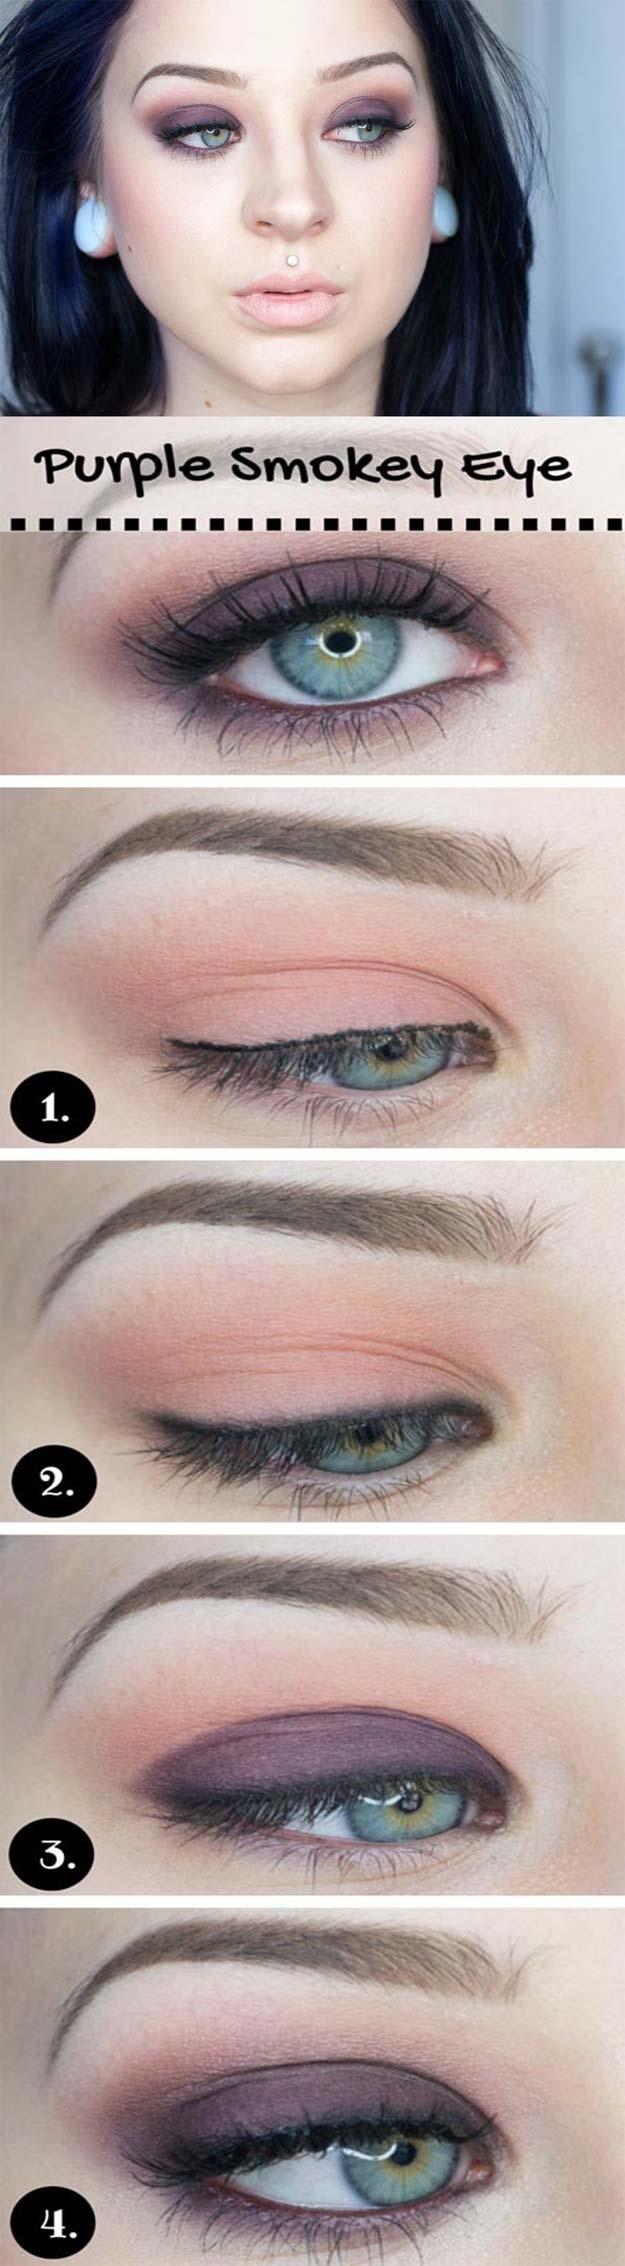 35 Wedding Makeup For Blue Eyes - The Goddess intended for Makeup Ideas For Blue Eyes For Wedding